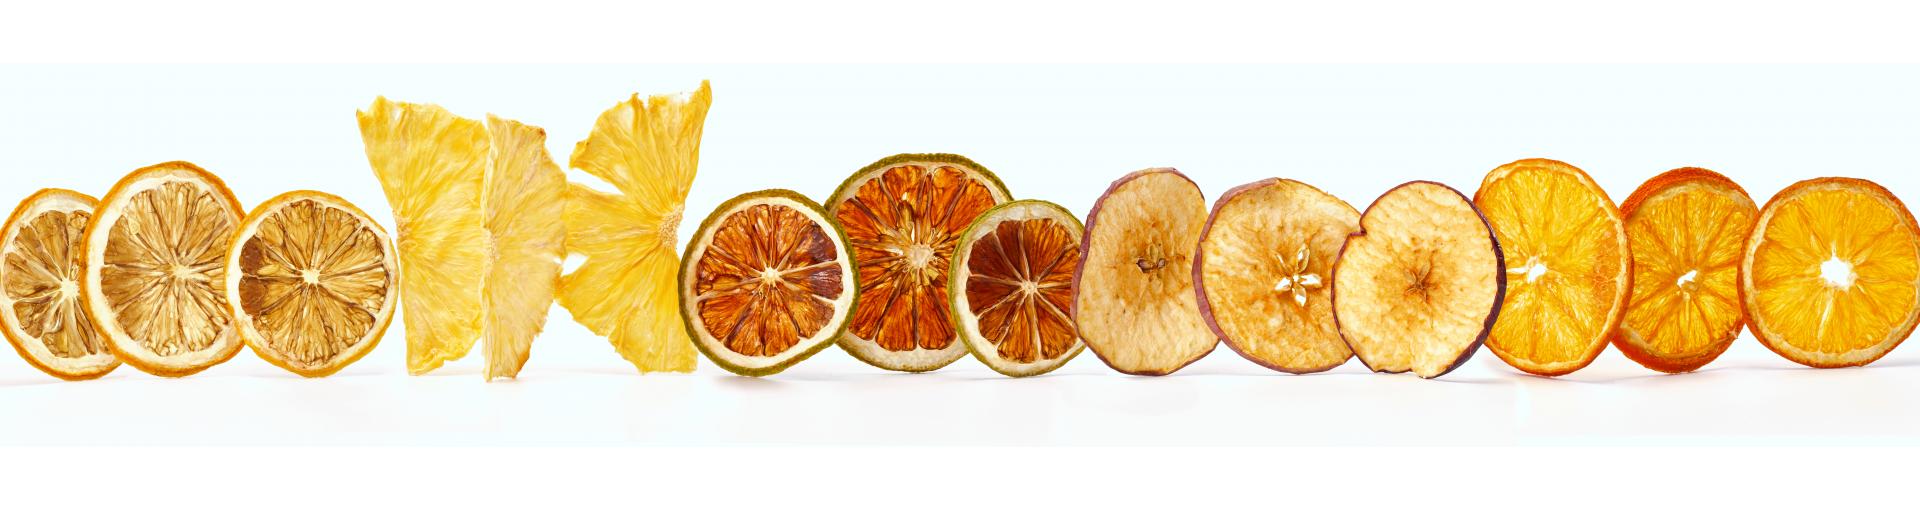 Funkin dehydrated fruits